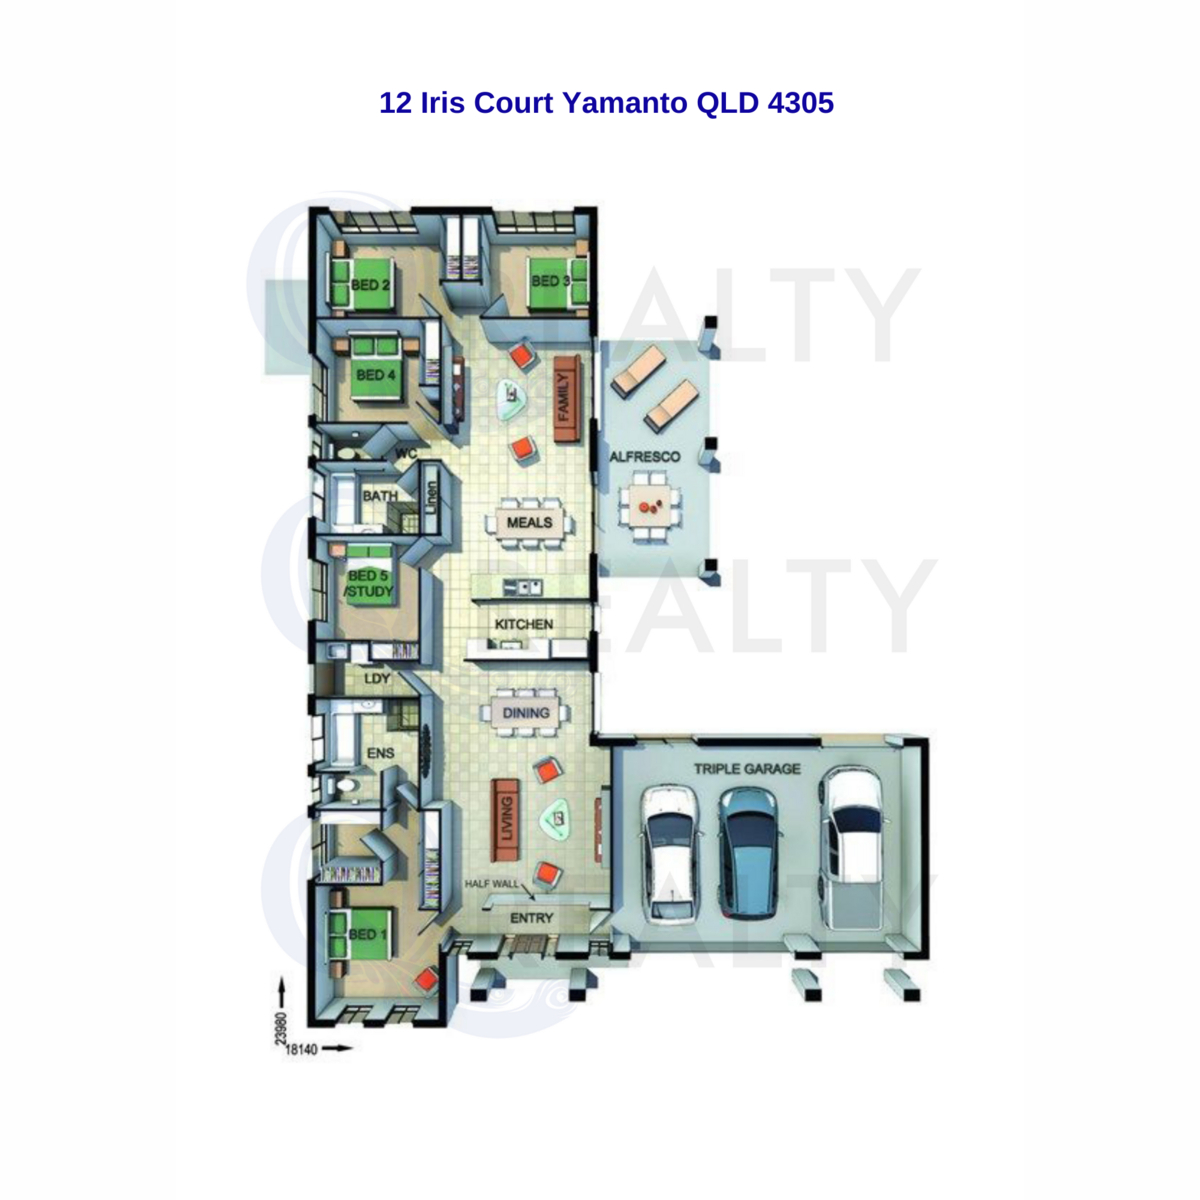 12 Iris Court, Yamanto  QLD  4305